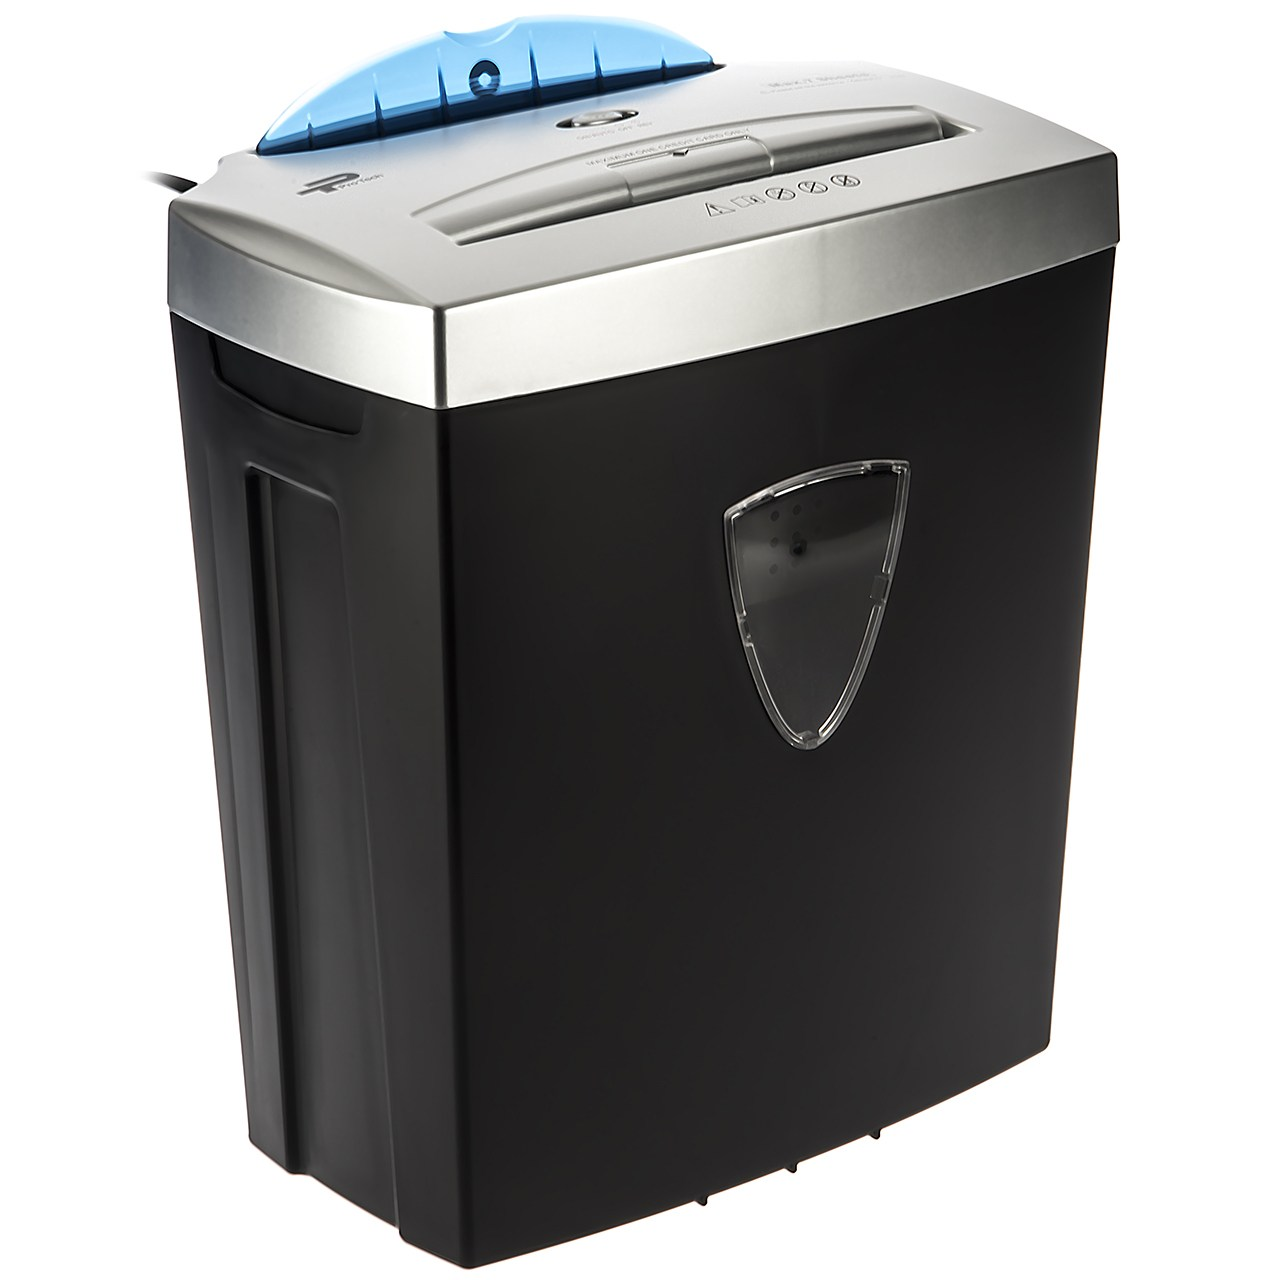 تصویر کاغذ خردکن مدل 468 پروتک Paper shredder model 468 Protek